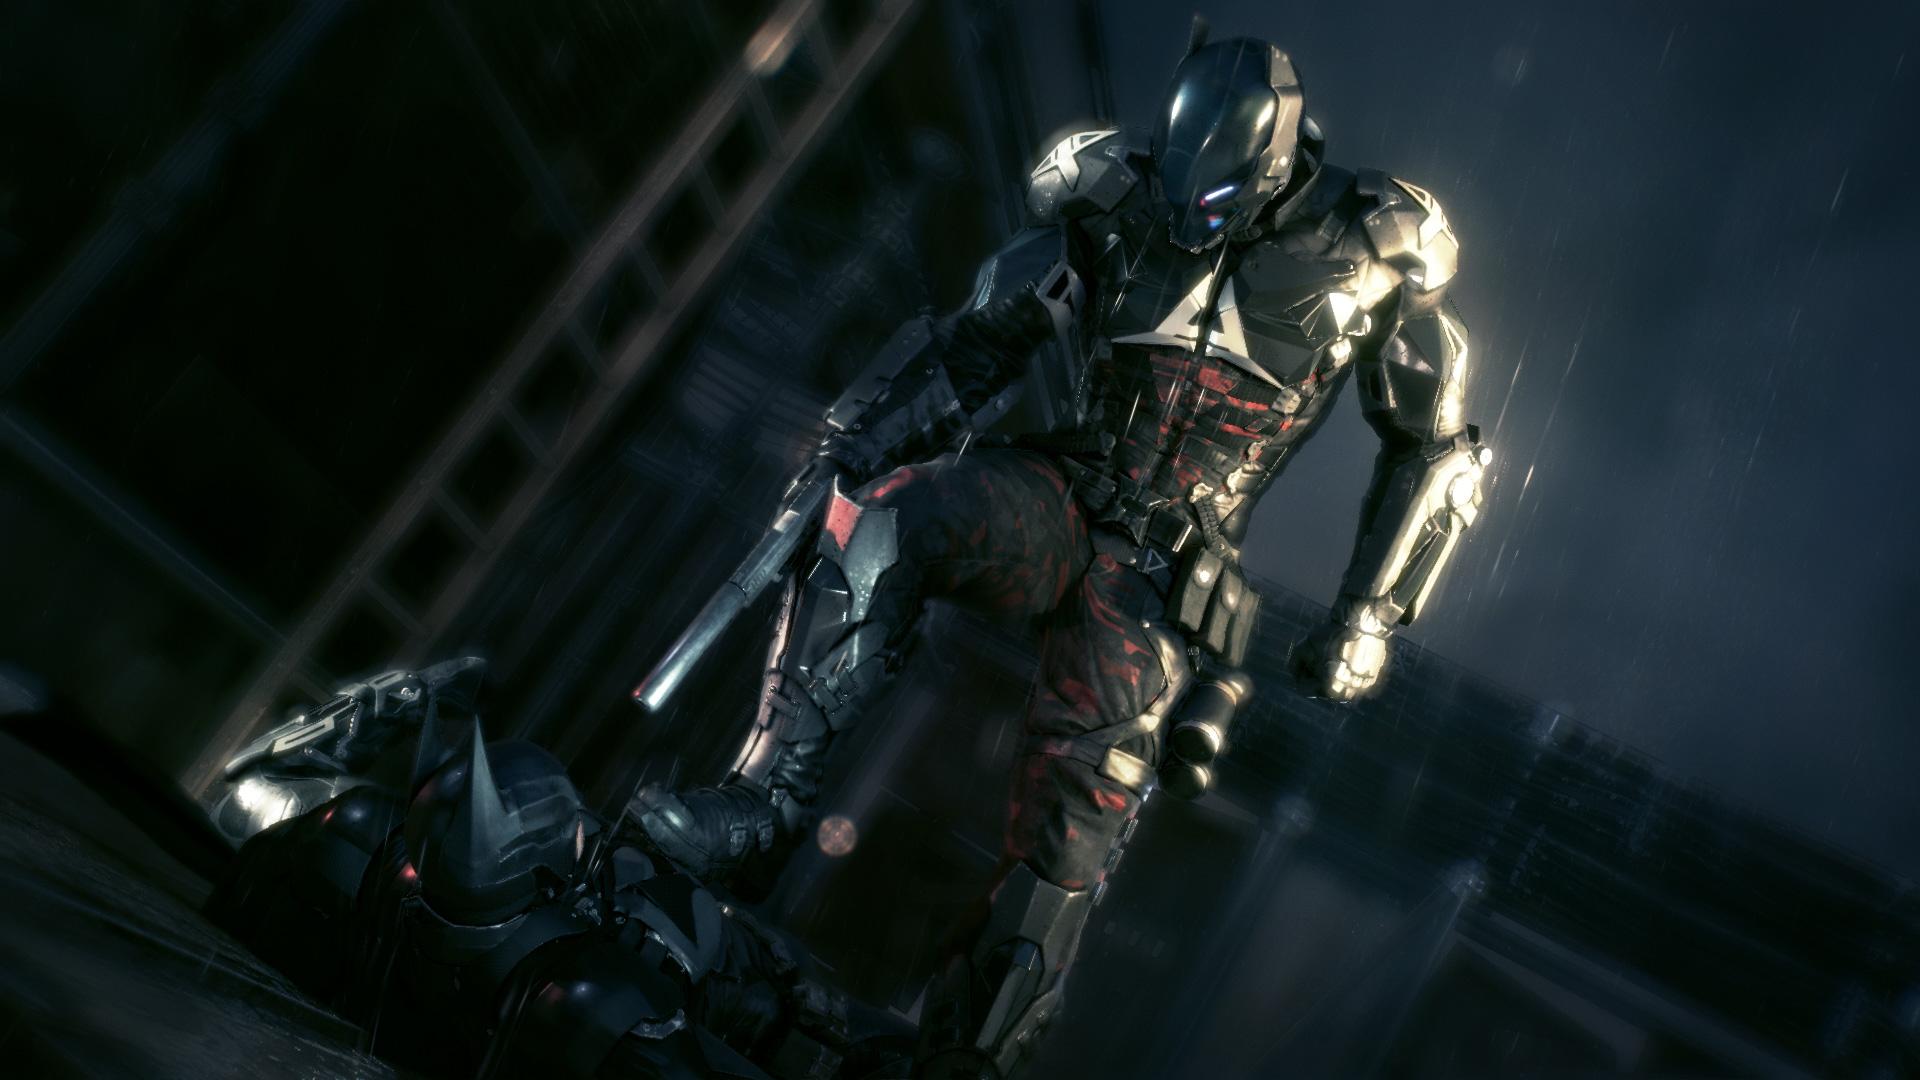 Warner Bros Offer Refund On Batman: Arkham Knight PC Version As Problems Persist